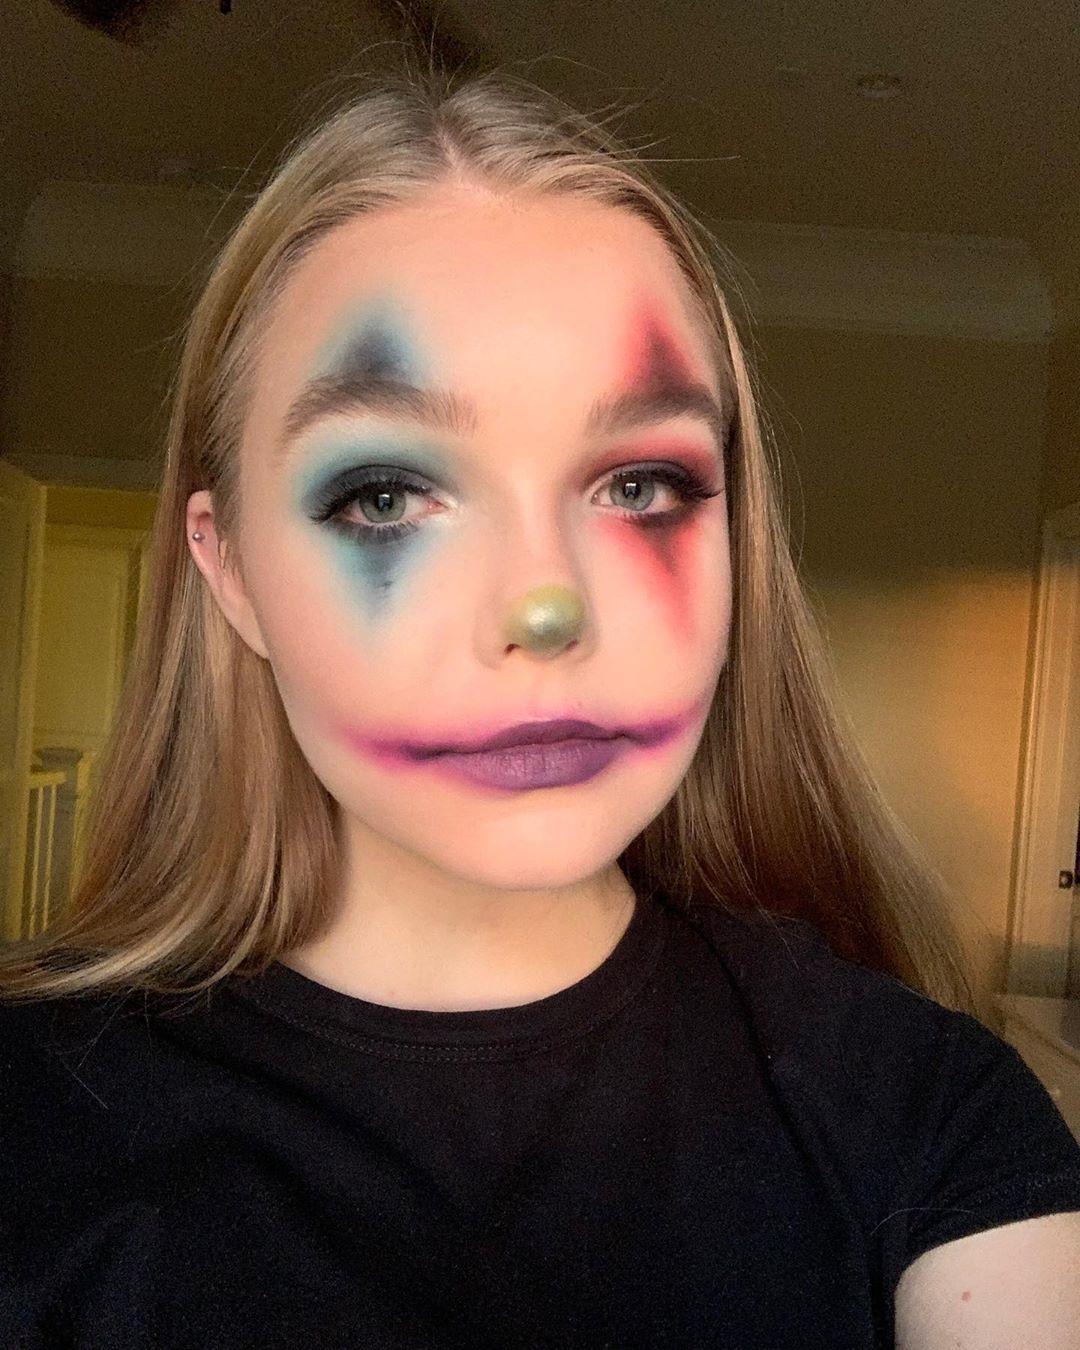 Pin By Stevee Stout On Halloween Clown Makeup Holloween Makeup Scary Makeup